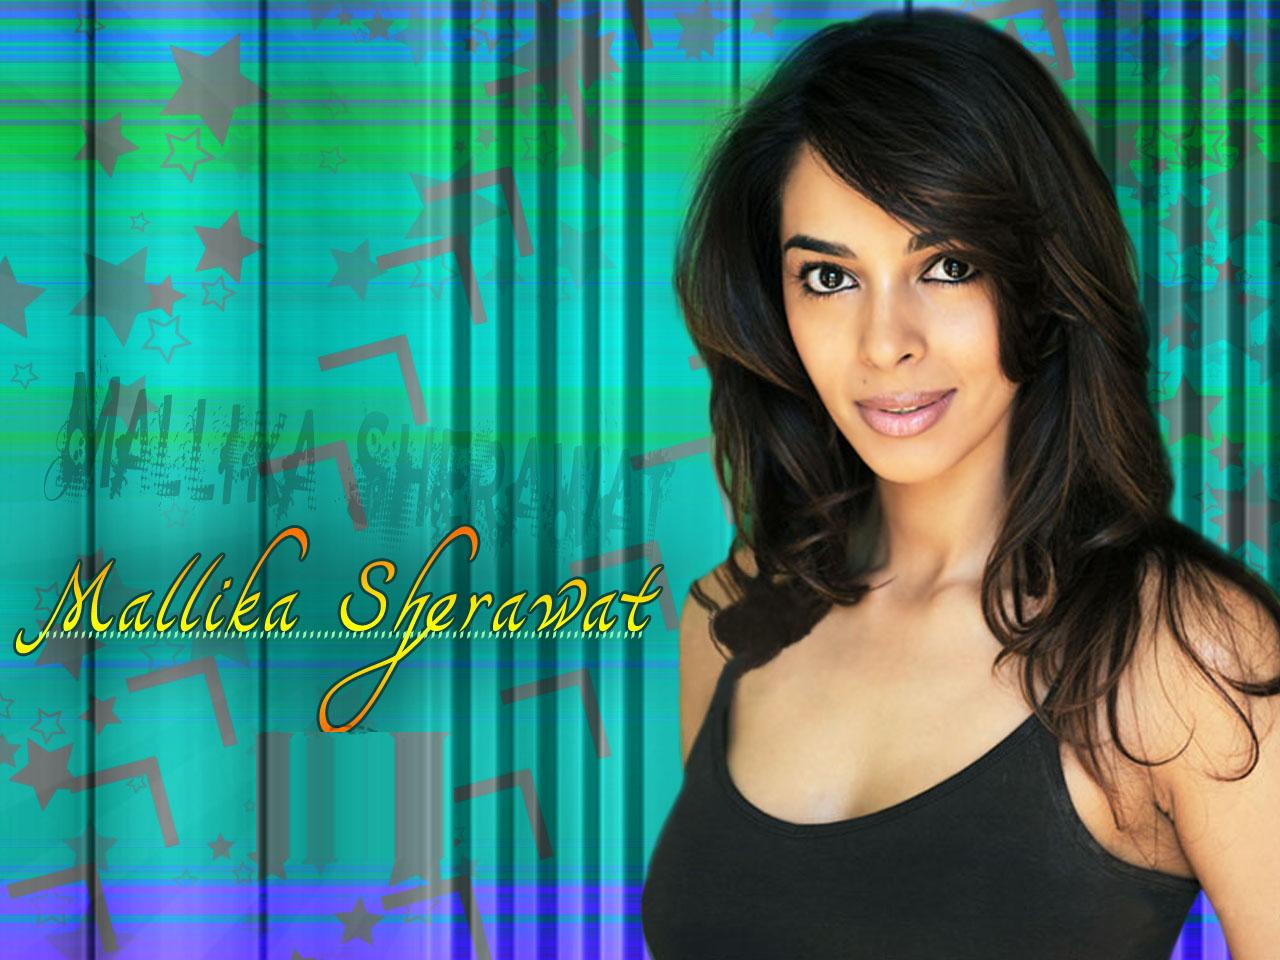 Mallika Sherawat Wallpaper  Bollywood Actresses Wallpaper